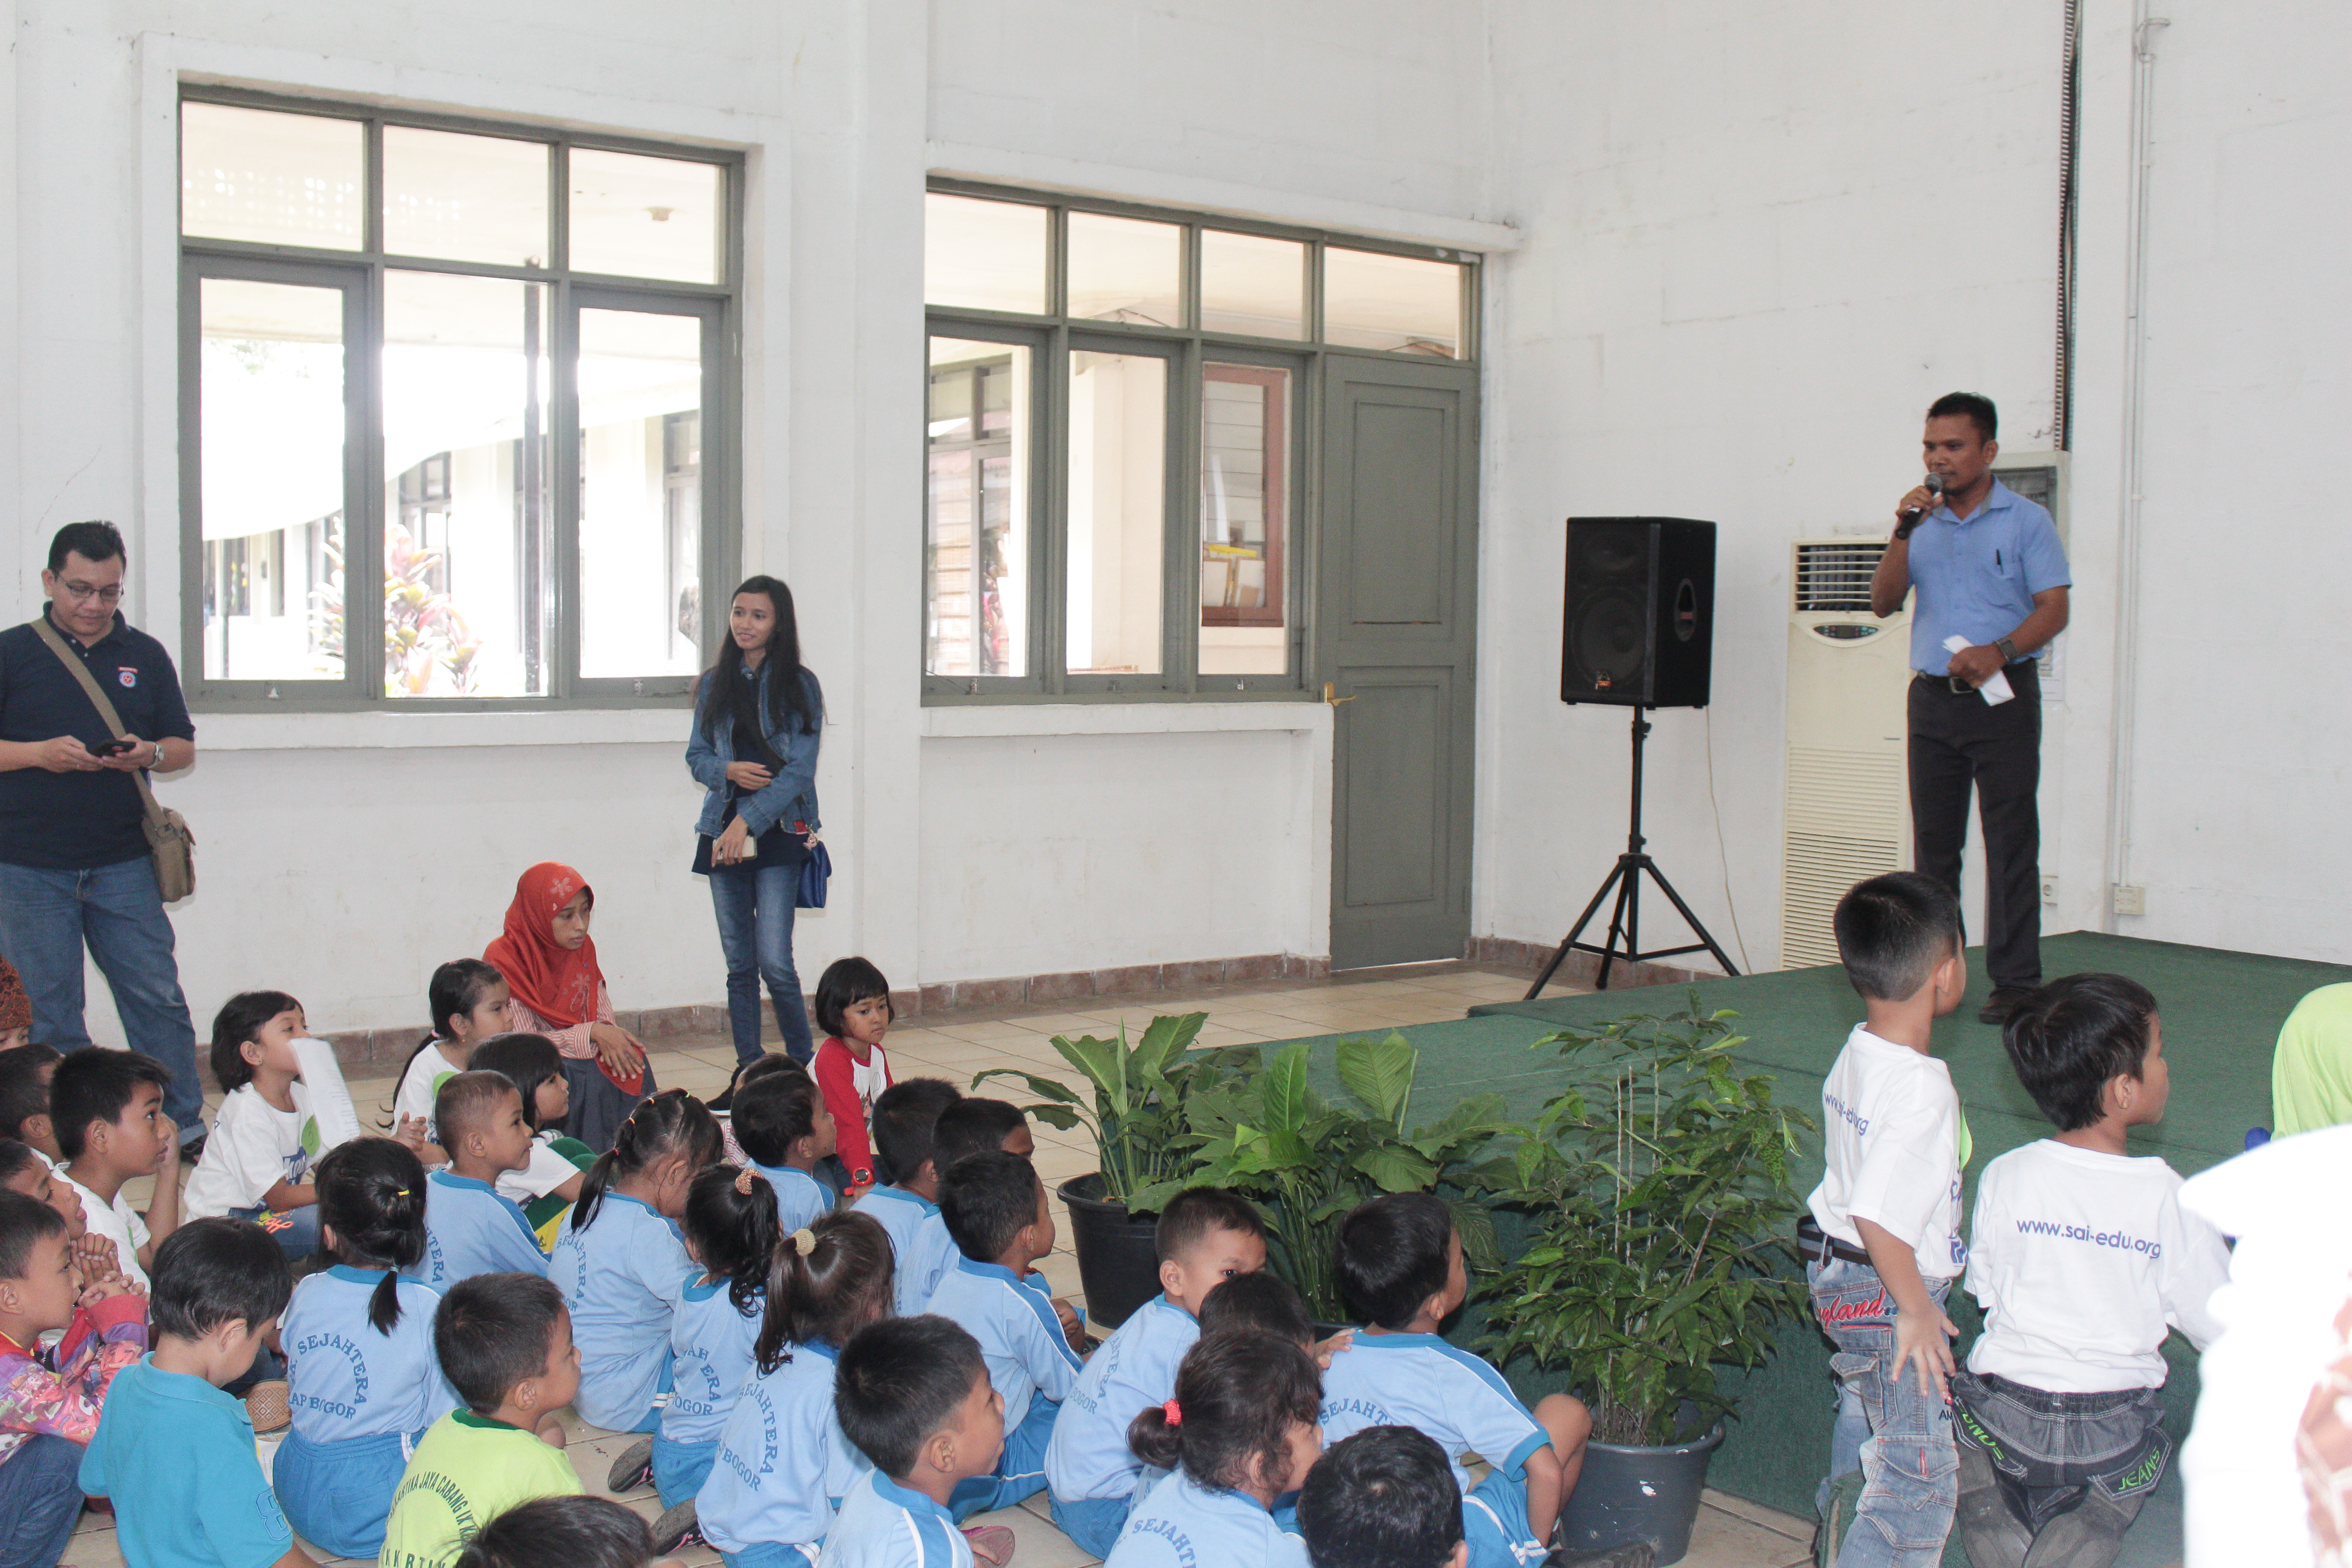 sekolah anak indoensia-sekolah Papua-lomba mewarnai-lomba menggambar_ sekolah papua di sentul-sekolah anak papua-sekolah hebat-pertunjunkan anak papua2